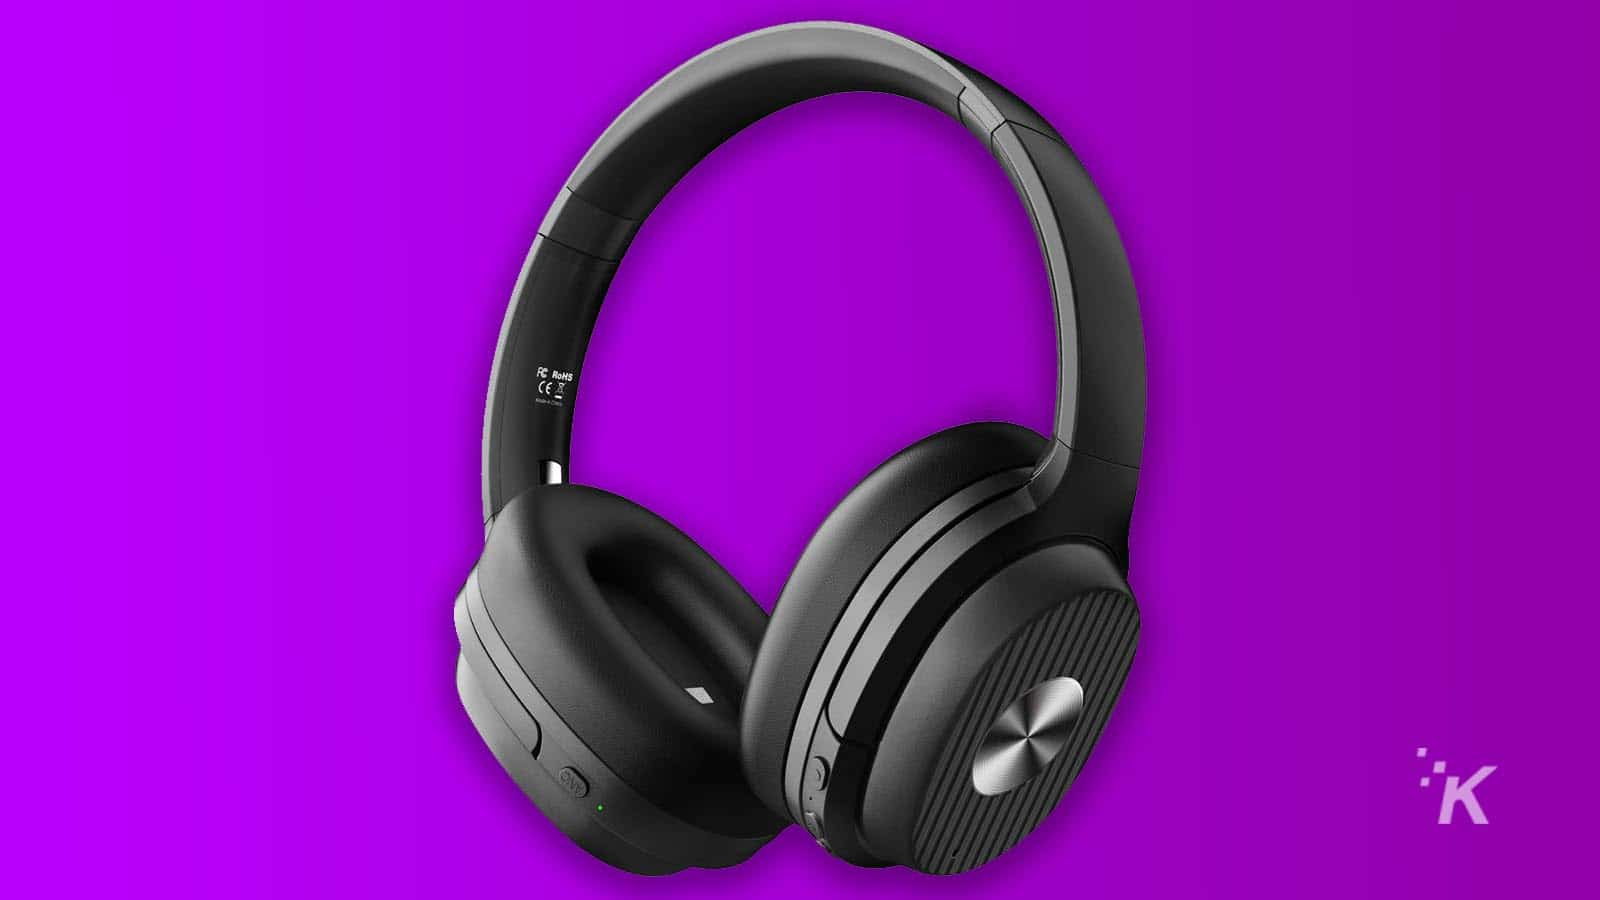 eksa noise-canceling headphones